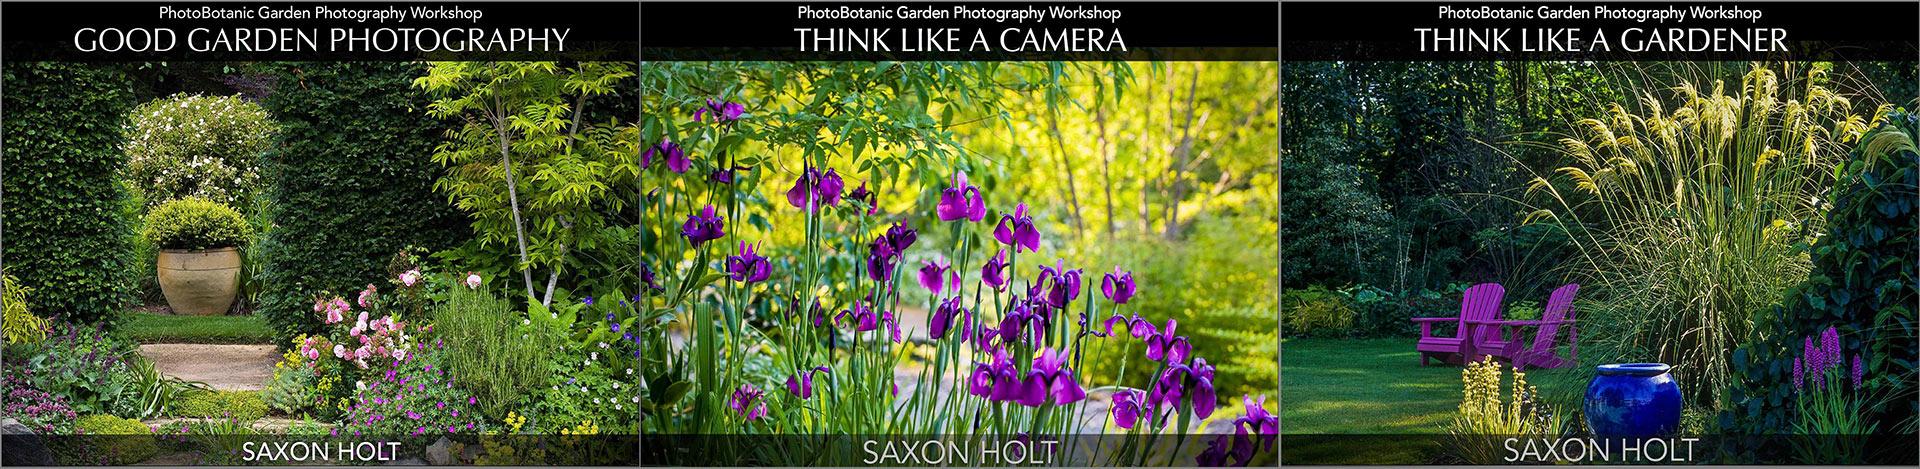 Composite 3 covers of PhotoBotanic Garden Photography Workshops